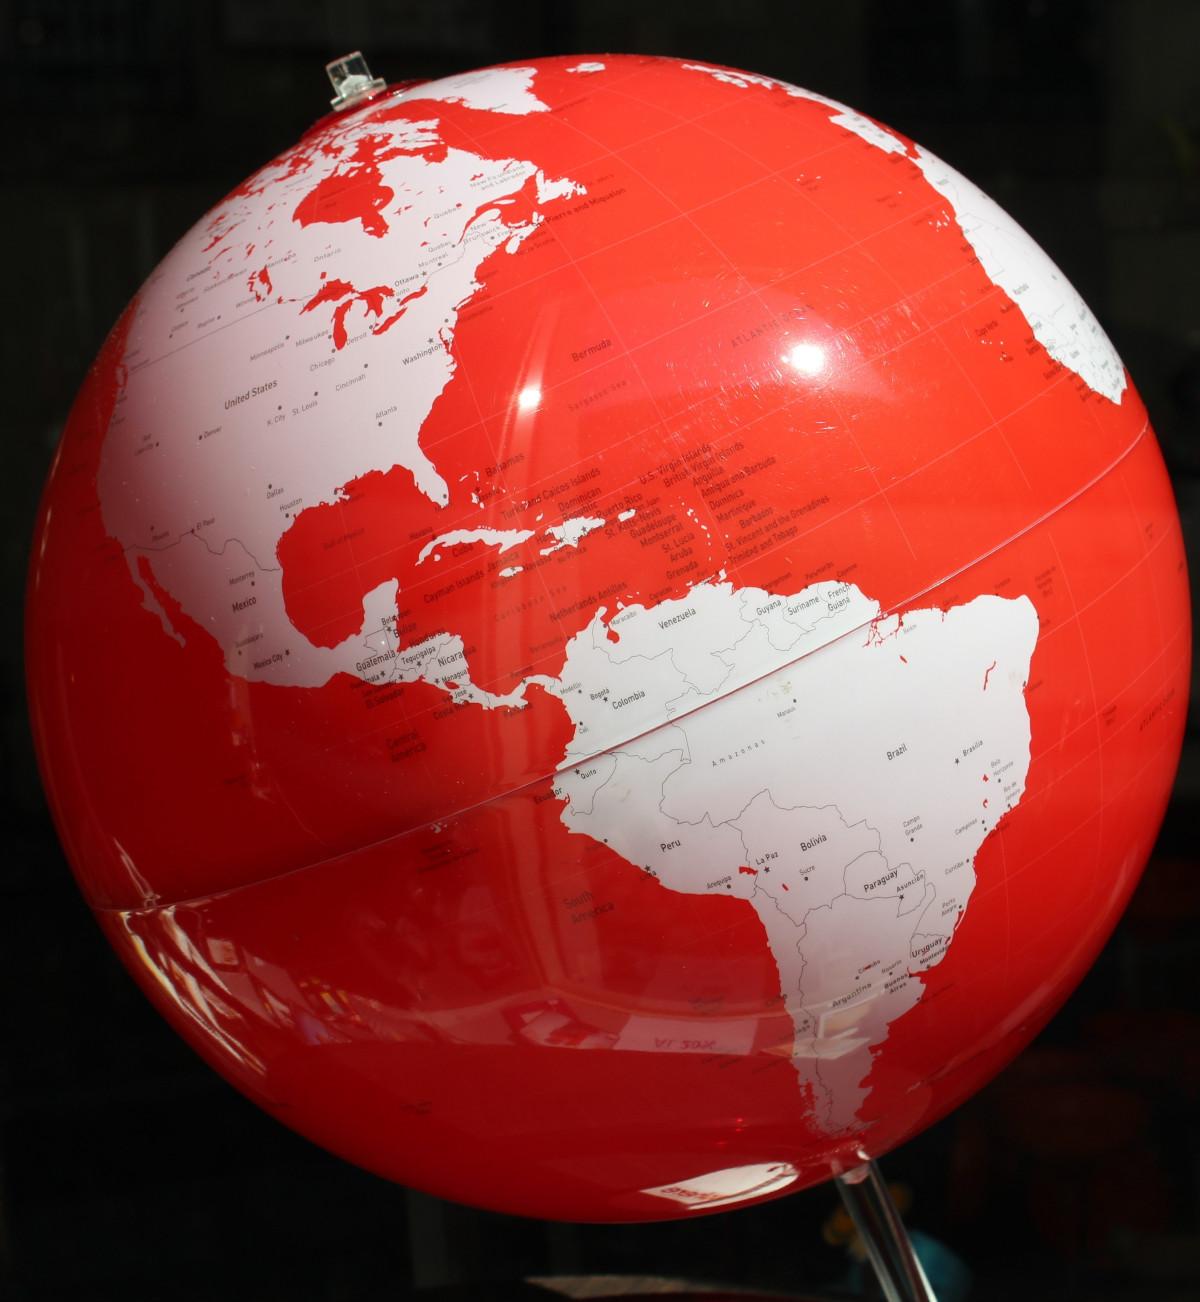 Free Images wood yellow map globe shape north america